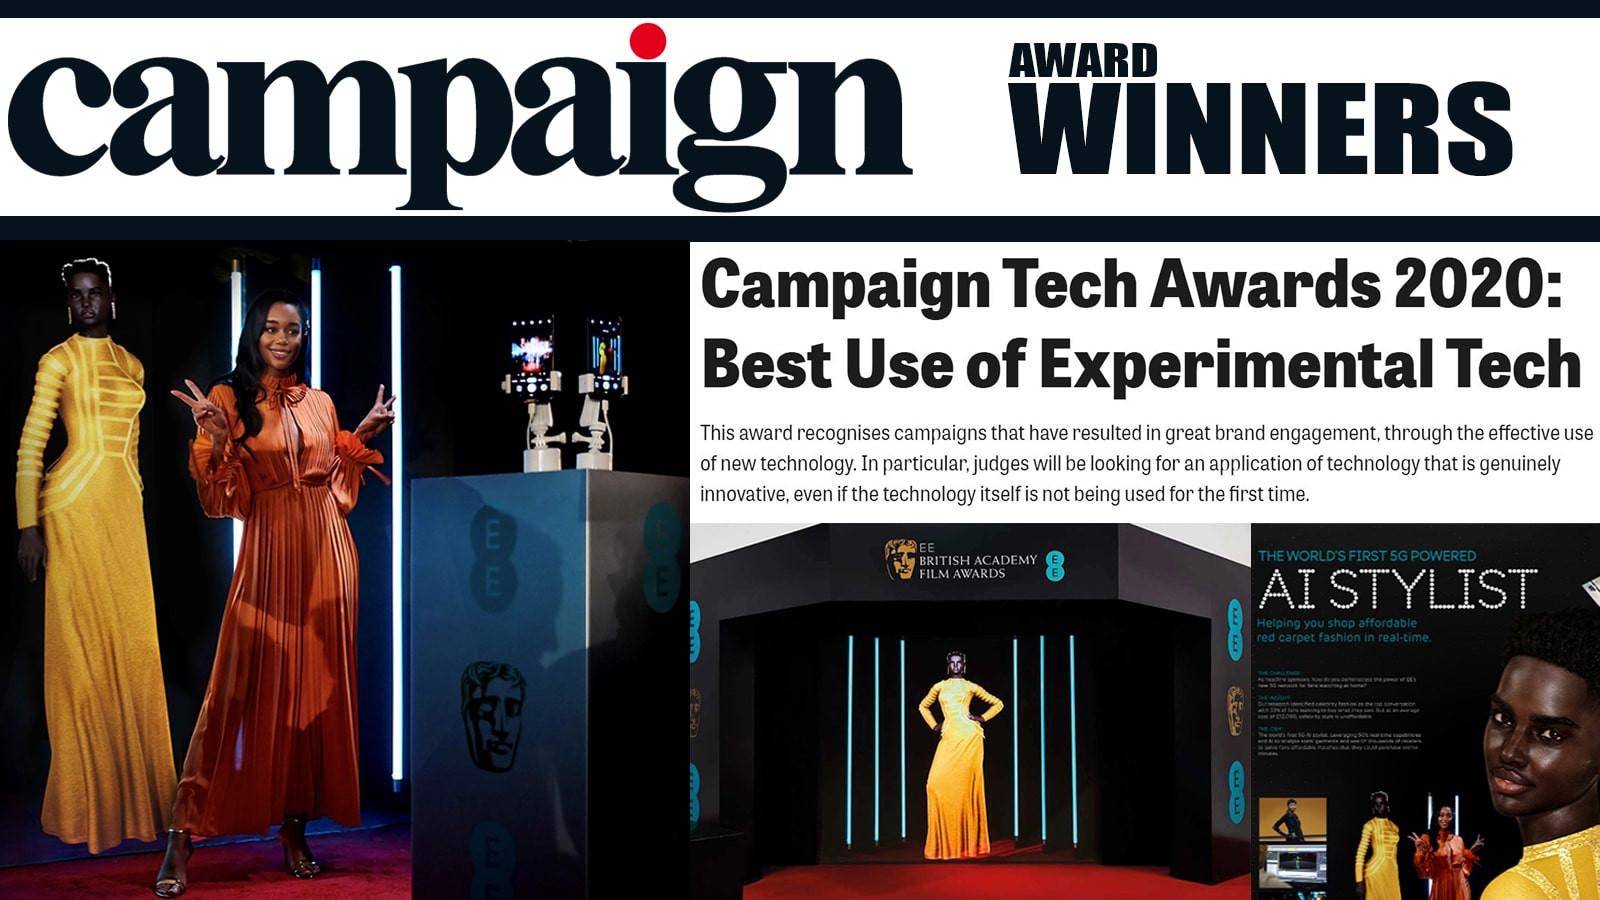 CampaignAwards-26-6-20-min.jpg